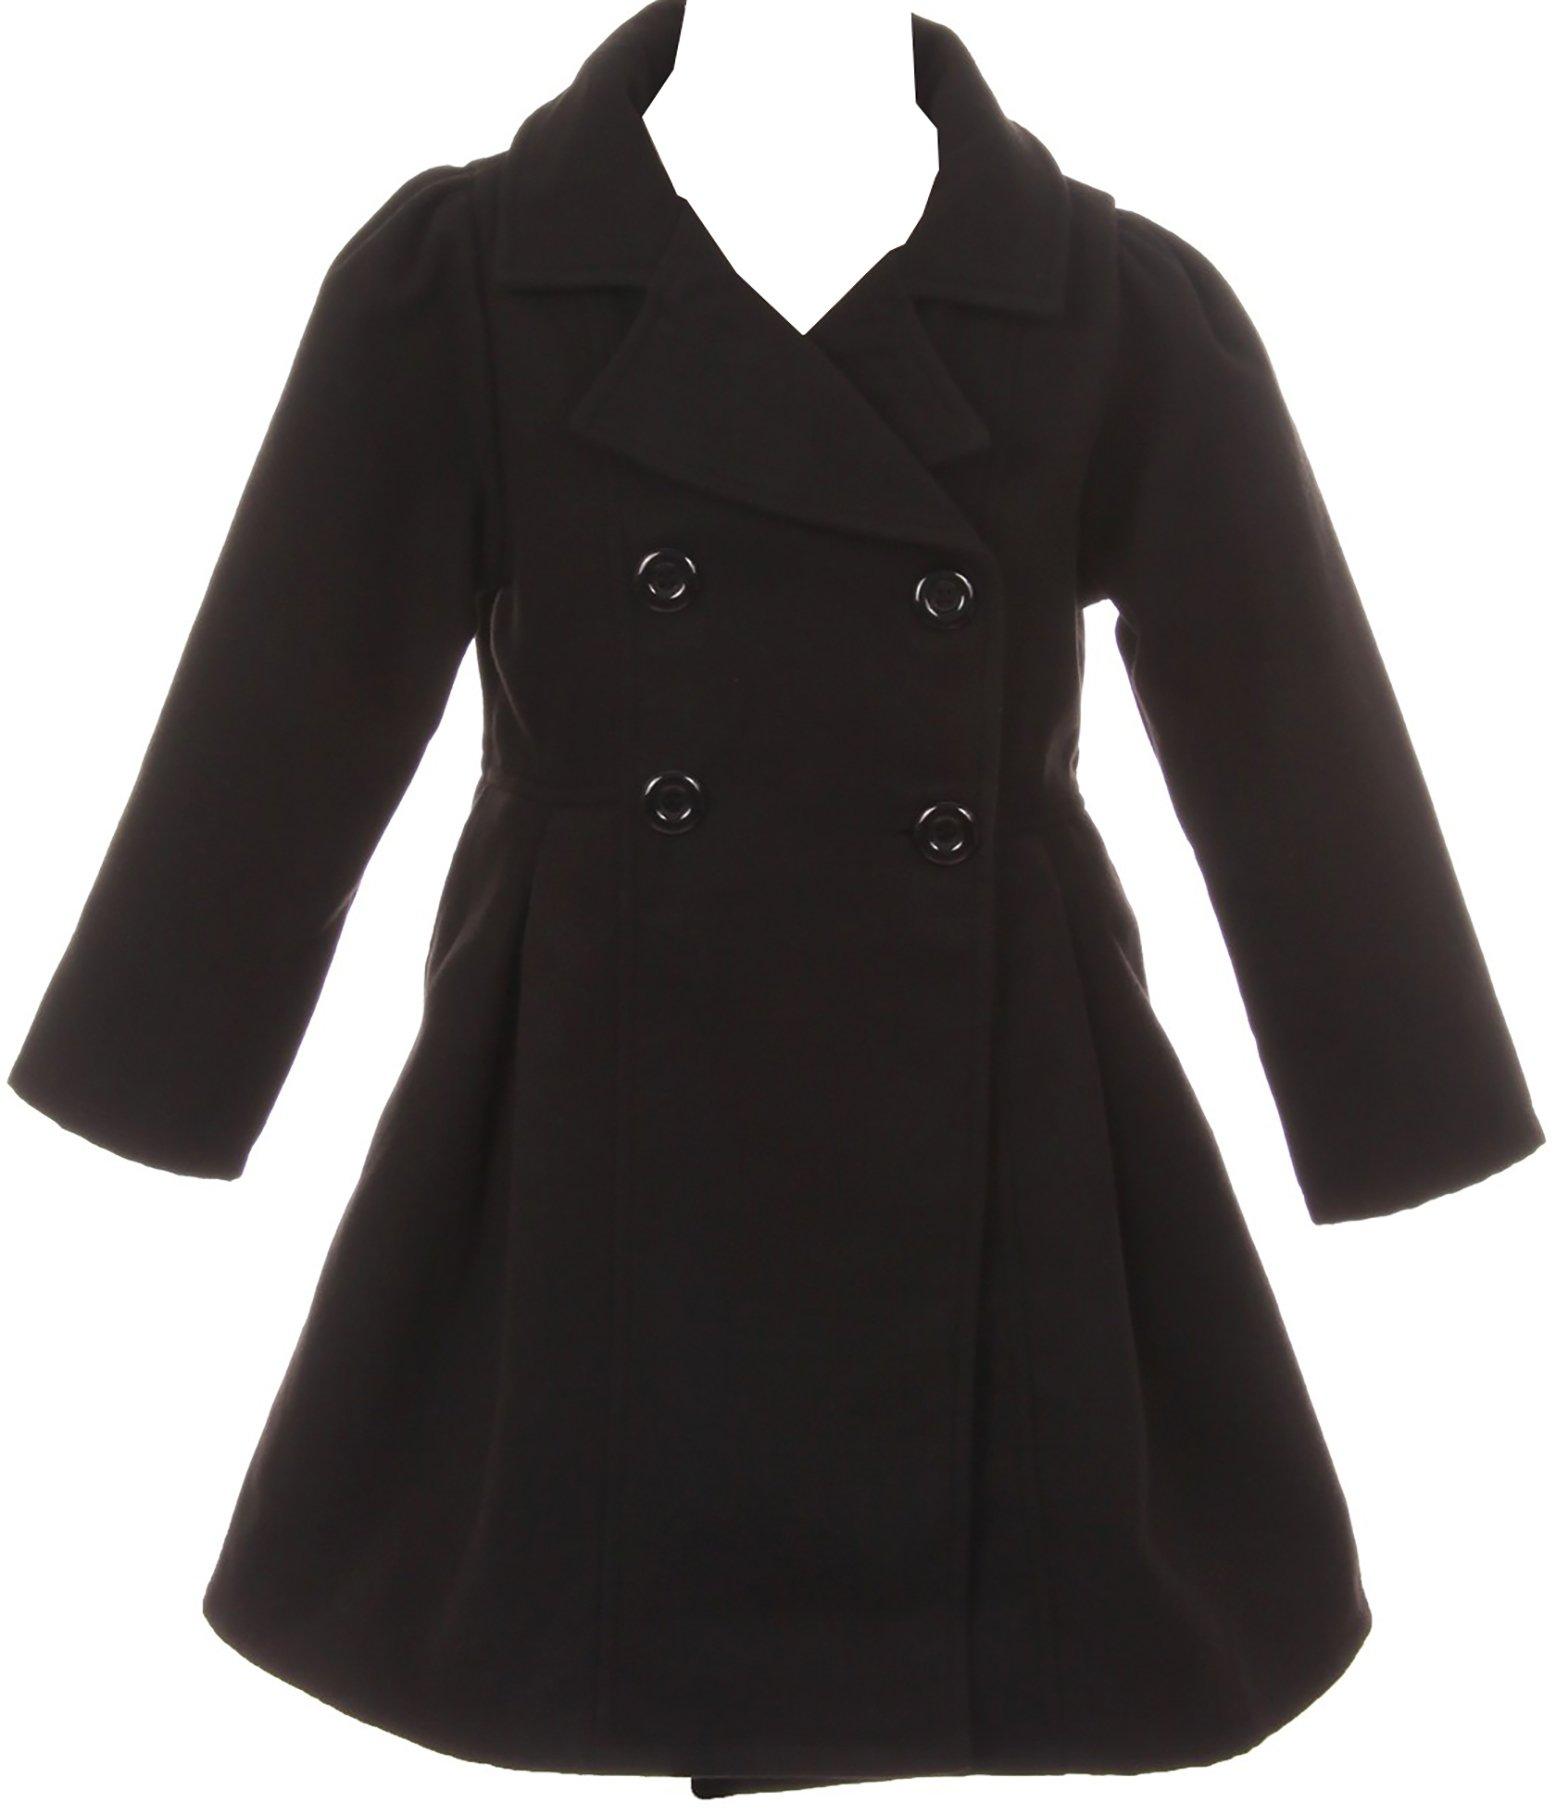 BNY Corner Big Girl Kids Flower Girls Winter Clothes Long Coat Outerwear USA Black 10 JKS 2049